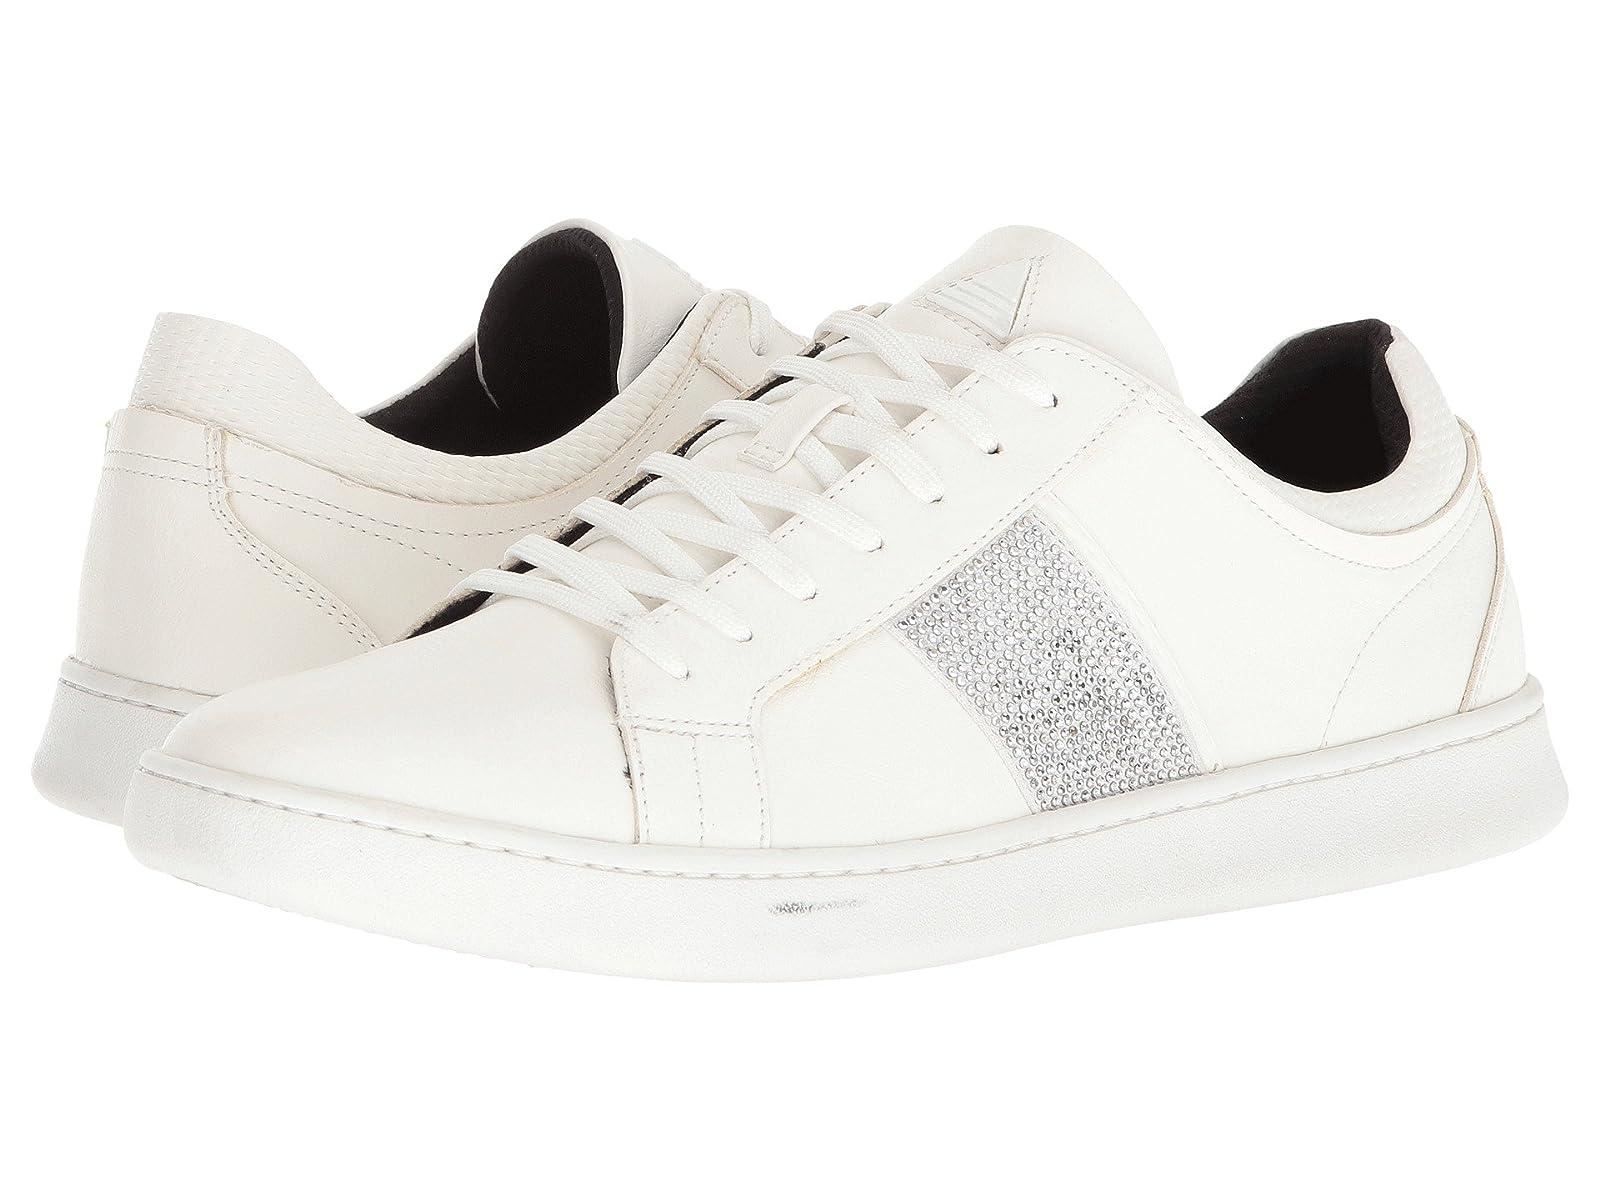 ALDO BrilisenAtmospheric grades have affordable shoes